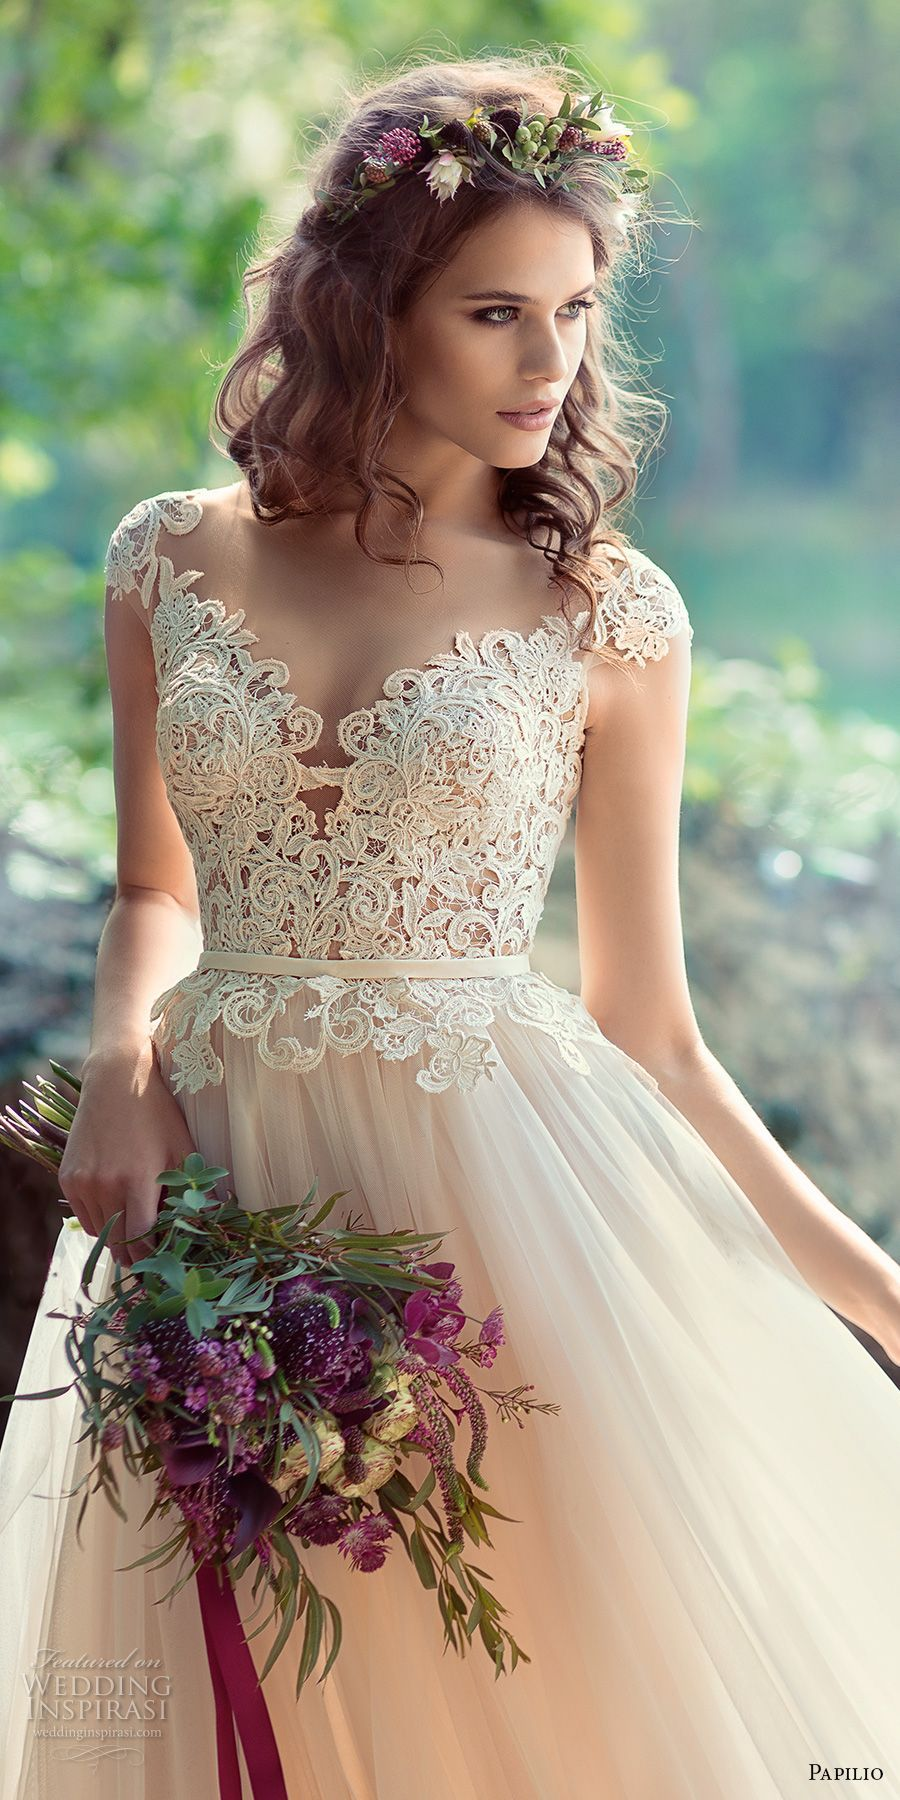 Papilio bridal cap sleeves sweetheart neckline heavily